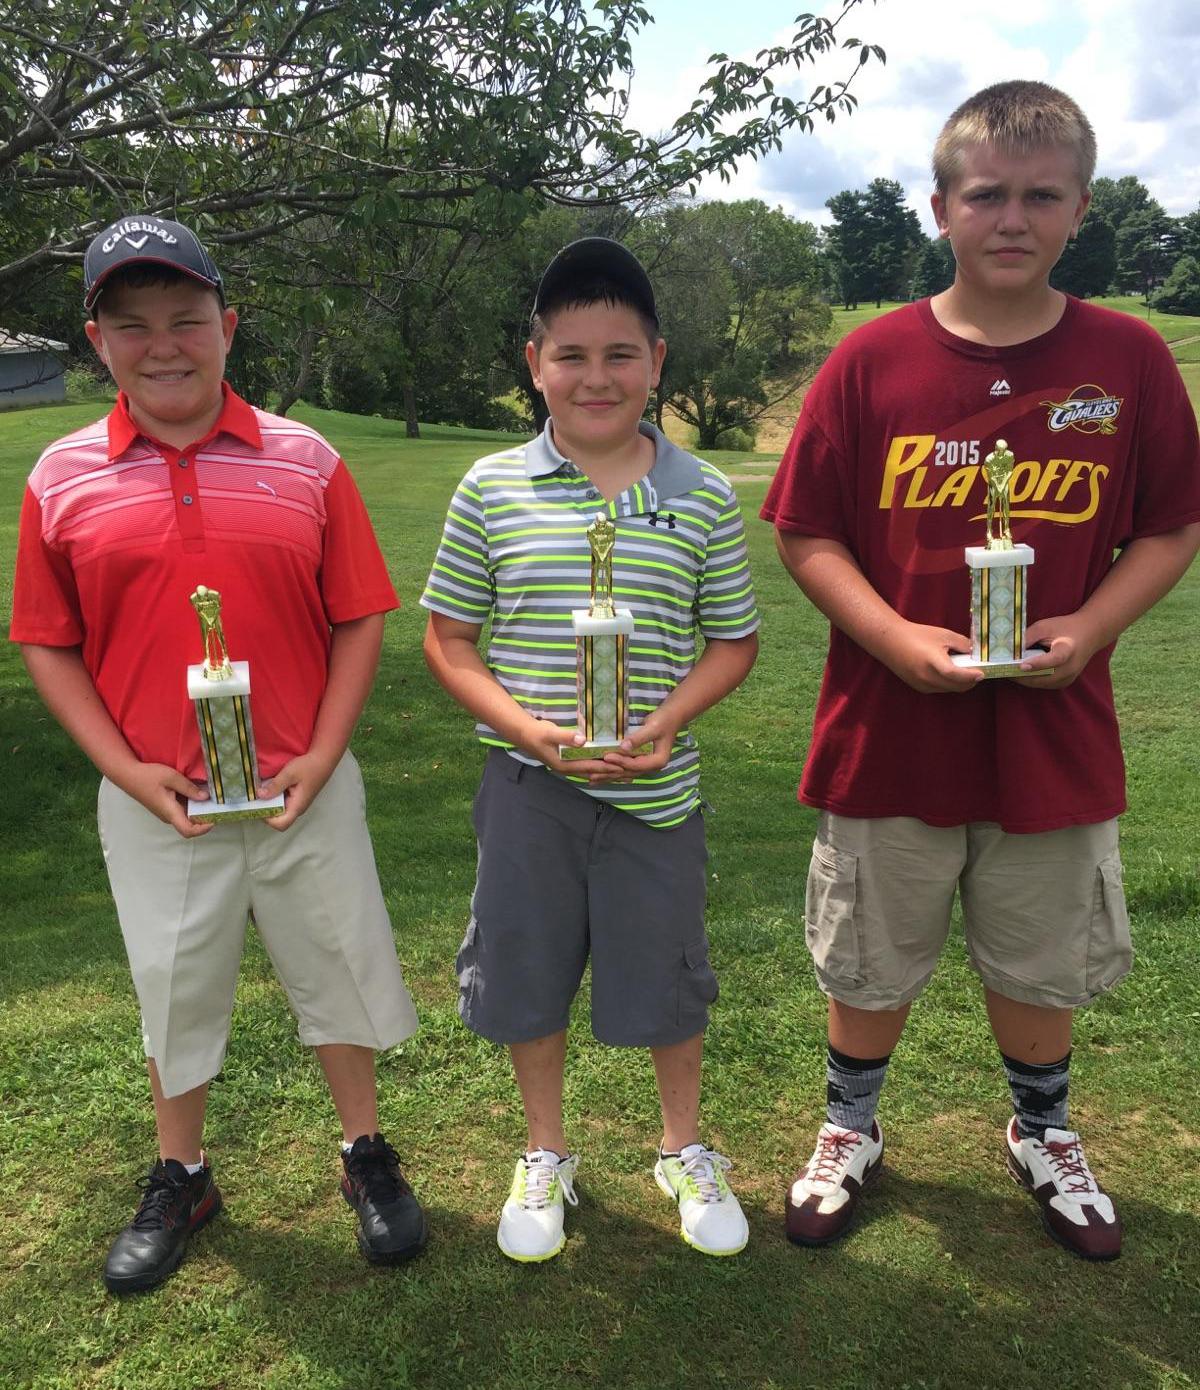 Boys Second Flight winners: From left, Dakota Pell-First Place, Derrick Pell-Second Place, and Luke Hayslip-Third Place.